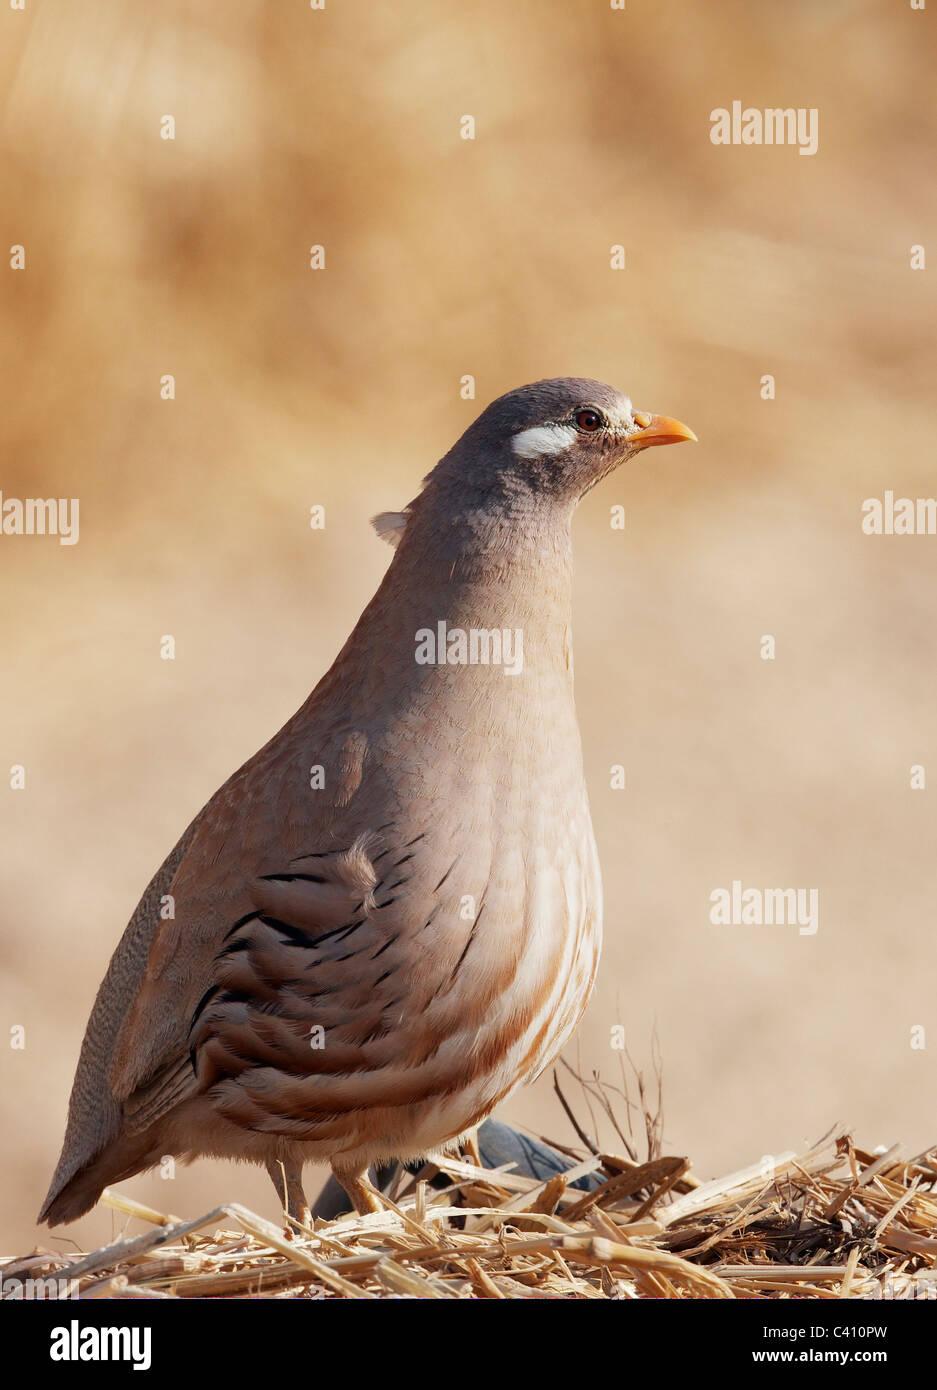 Sand Partridge (Ammoperdix heyi). Male standing on straw. Israel. Stock Photo